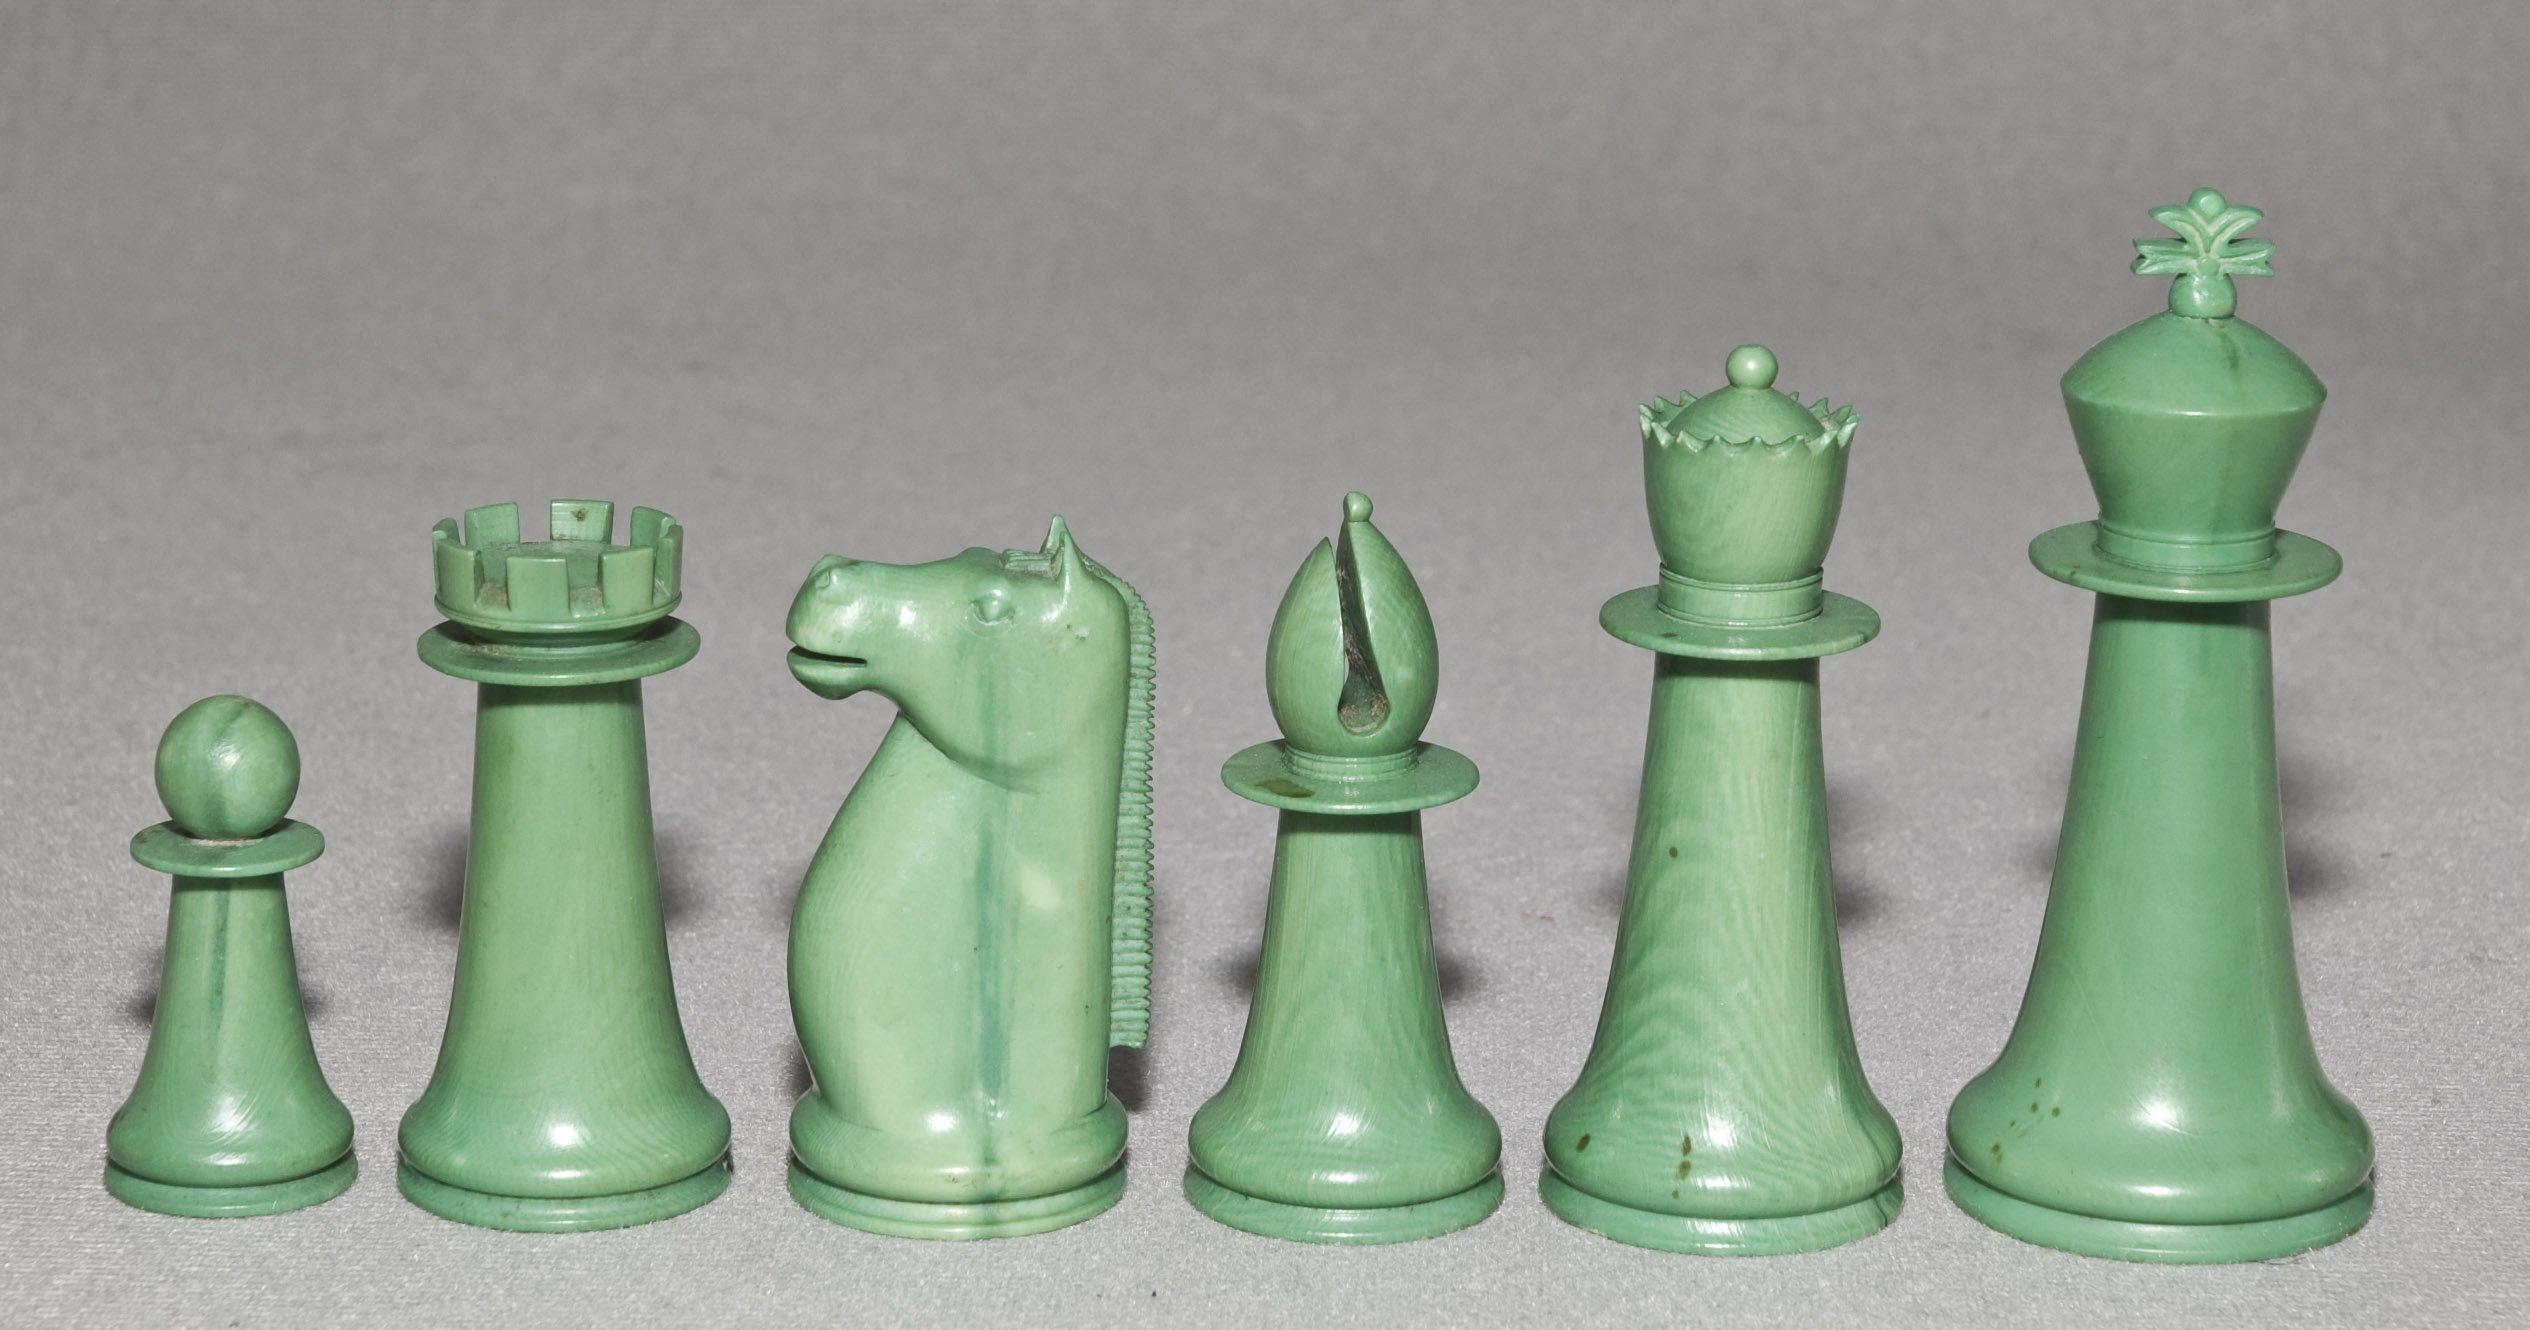 Antique Indian Staunton Chess Set, Green